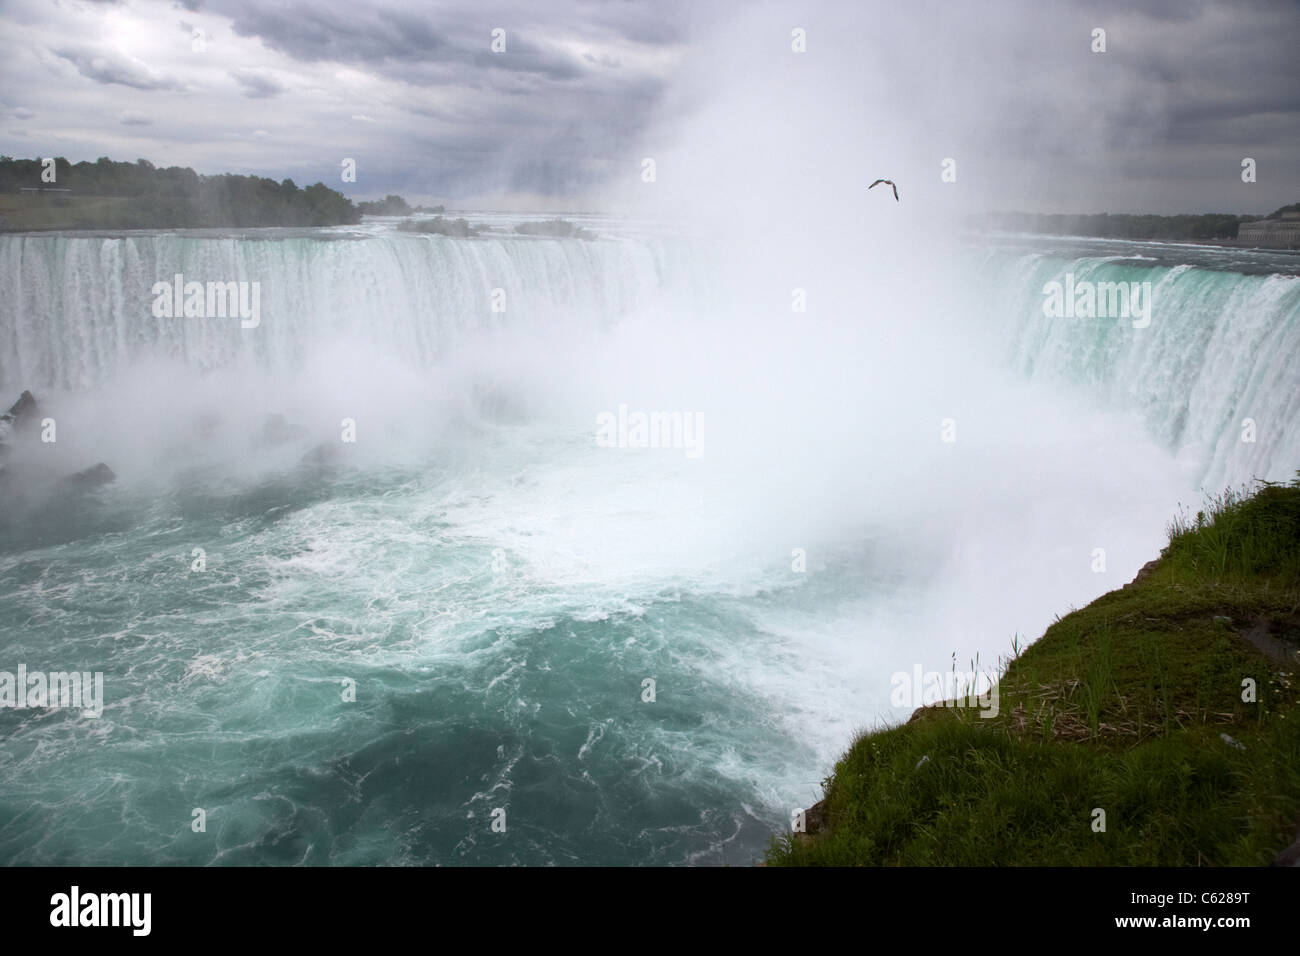 The horseshoe falls niagara falls ontario canada - Stock Image